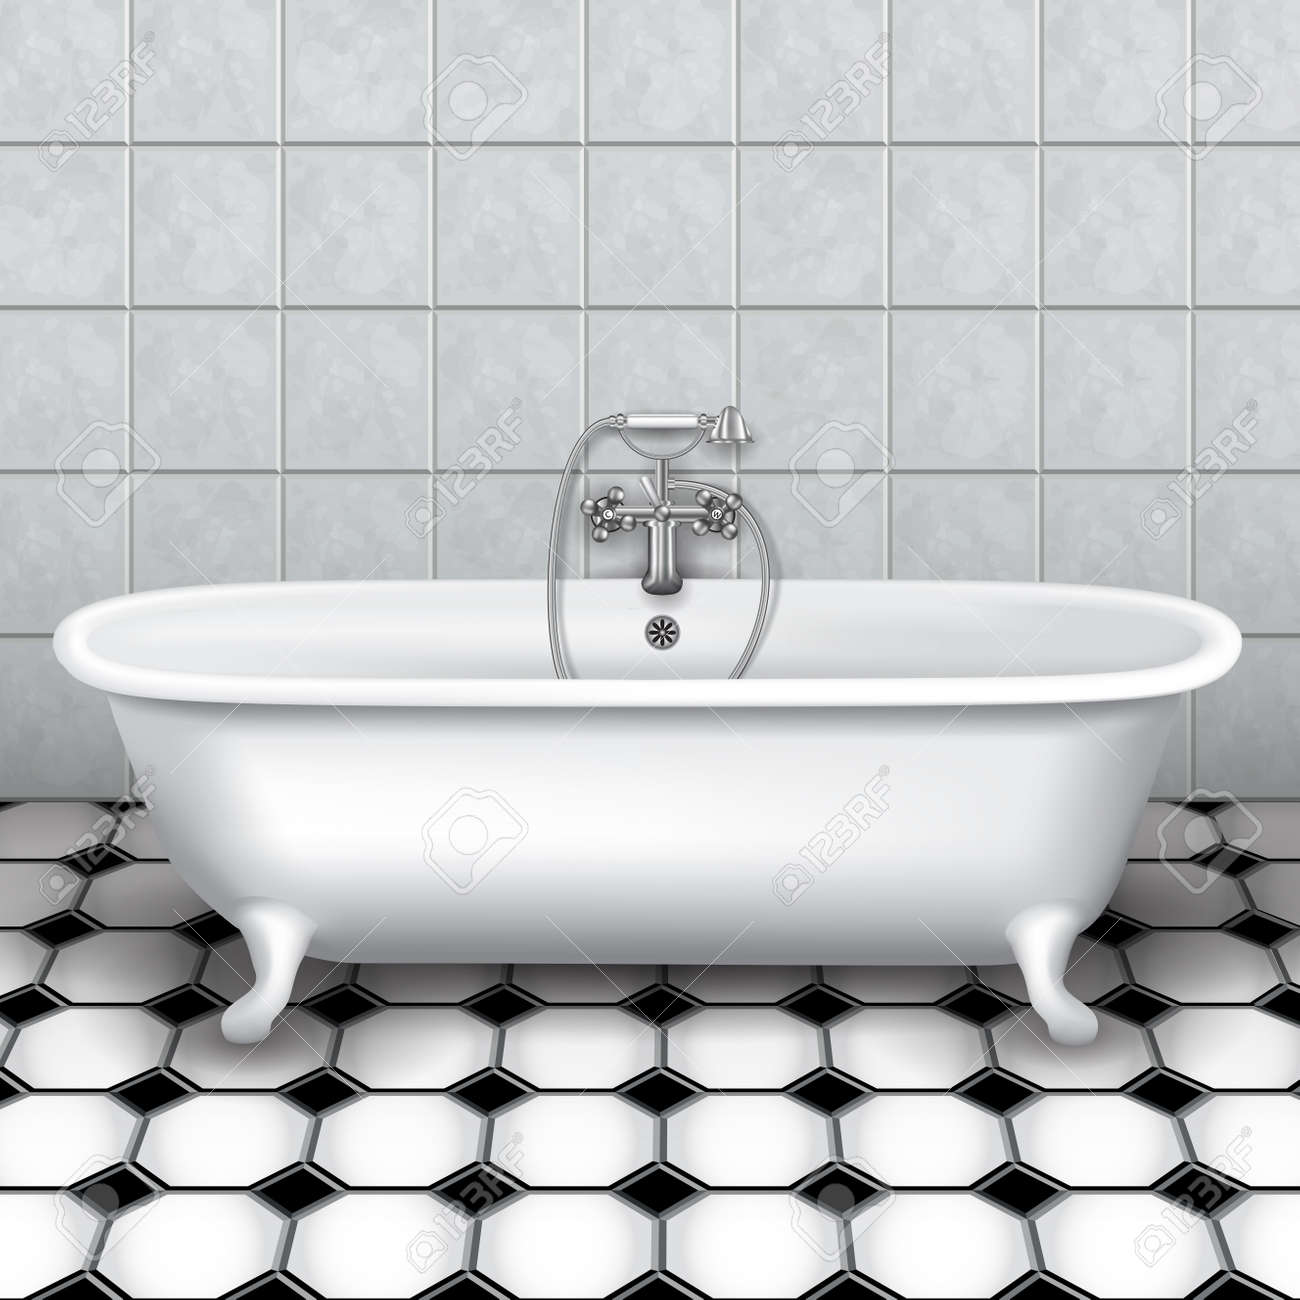 Retro Bathtub In A Tiled Bathroom. Vector Illustration Royalty Free ...